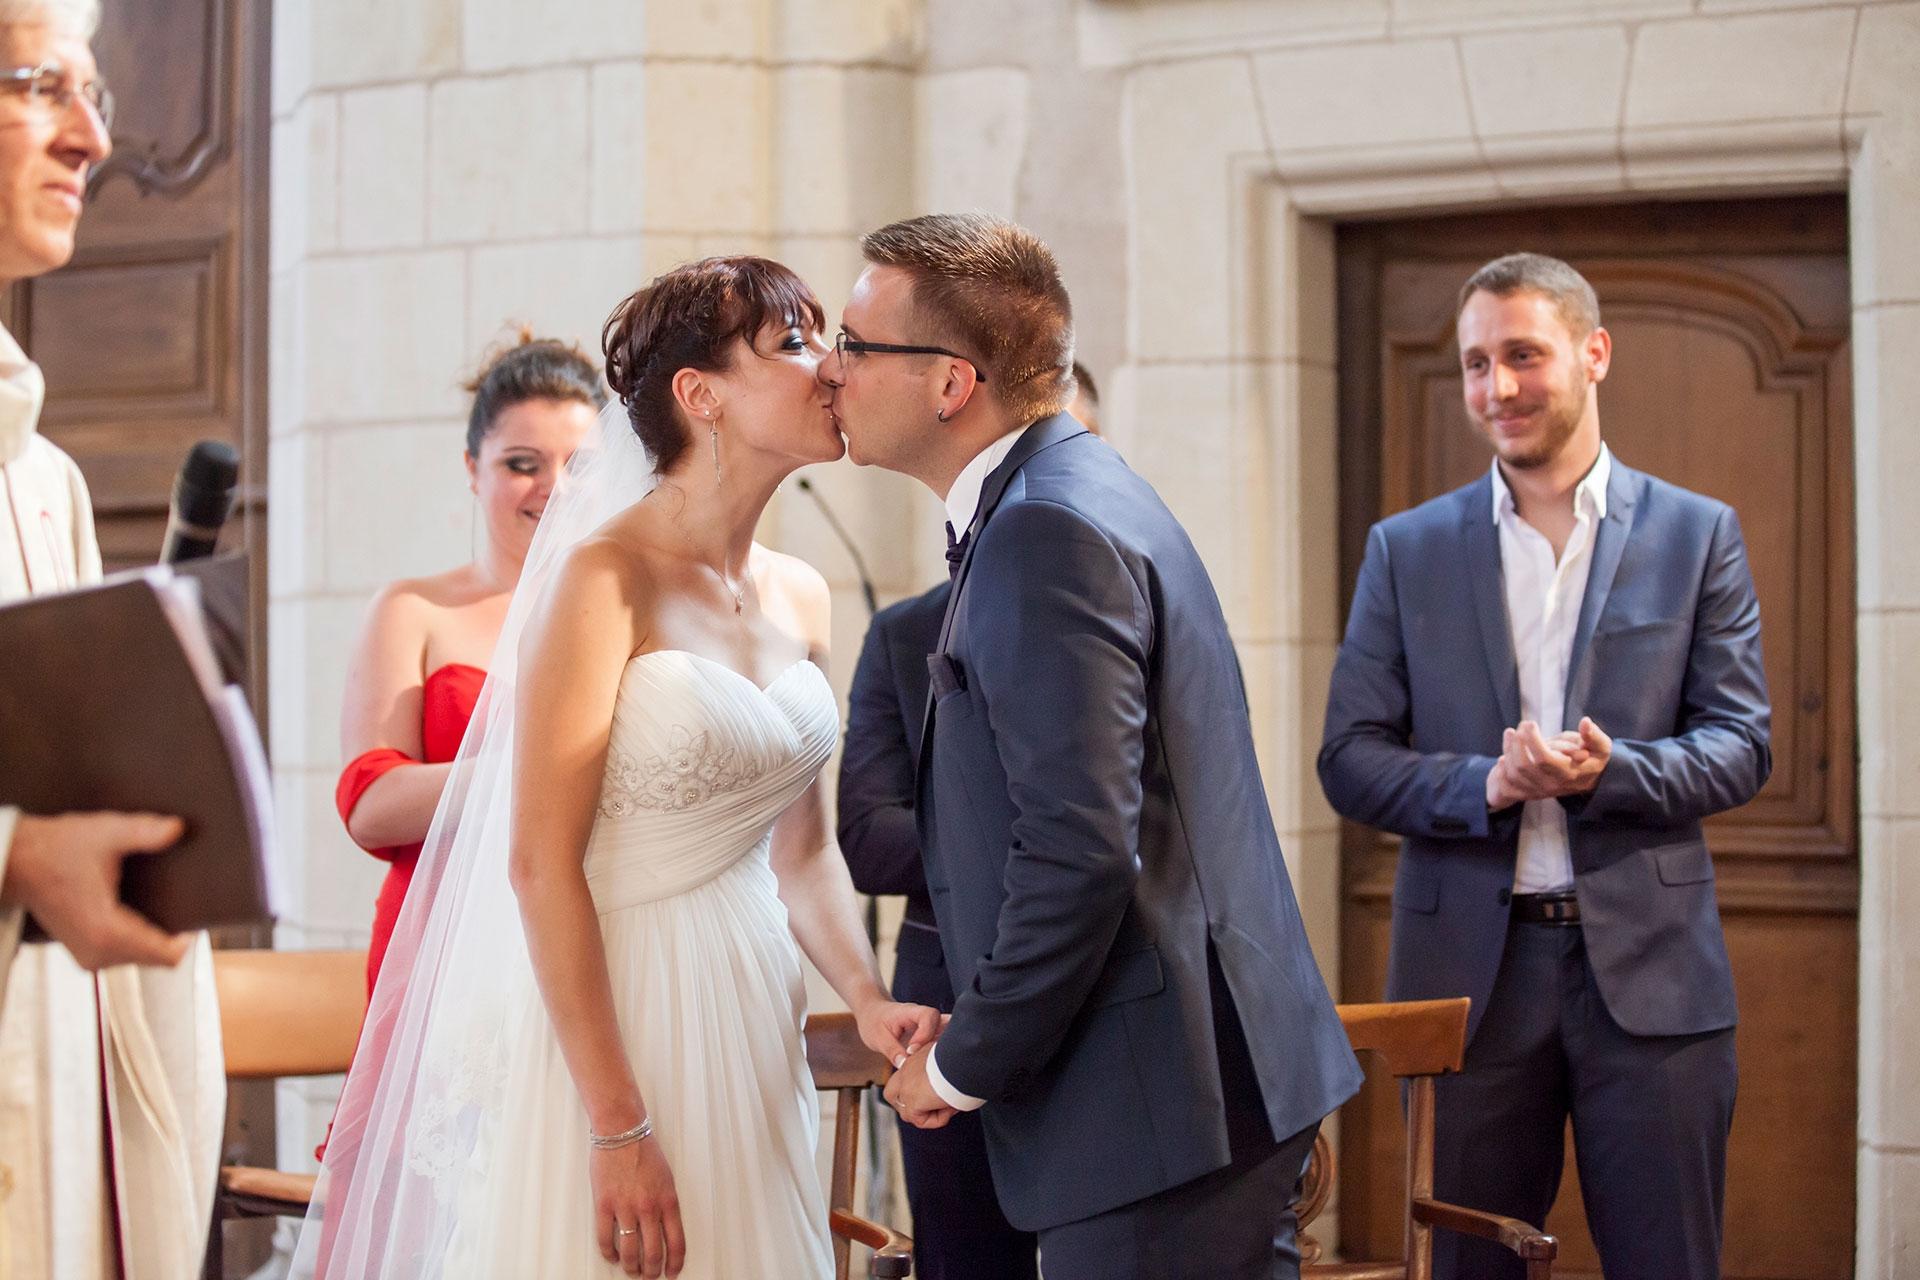 particuliers-evenements-mariages-oui-aurelie&geoffrey-22